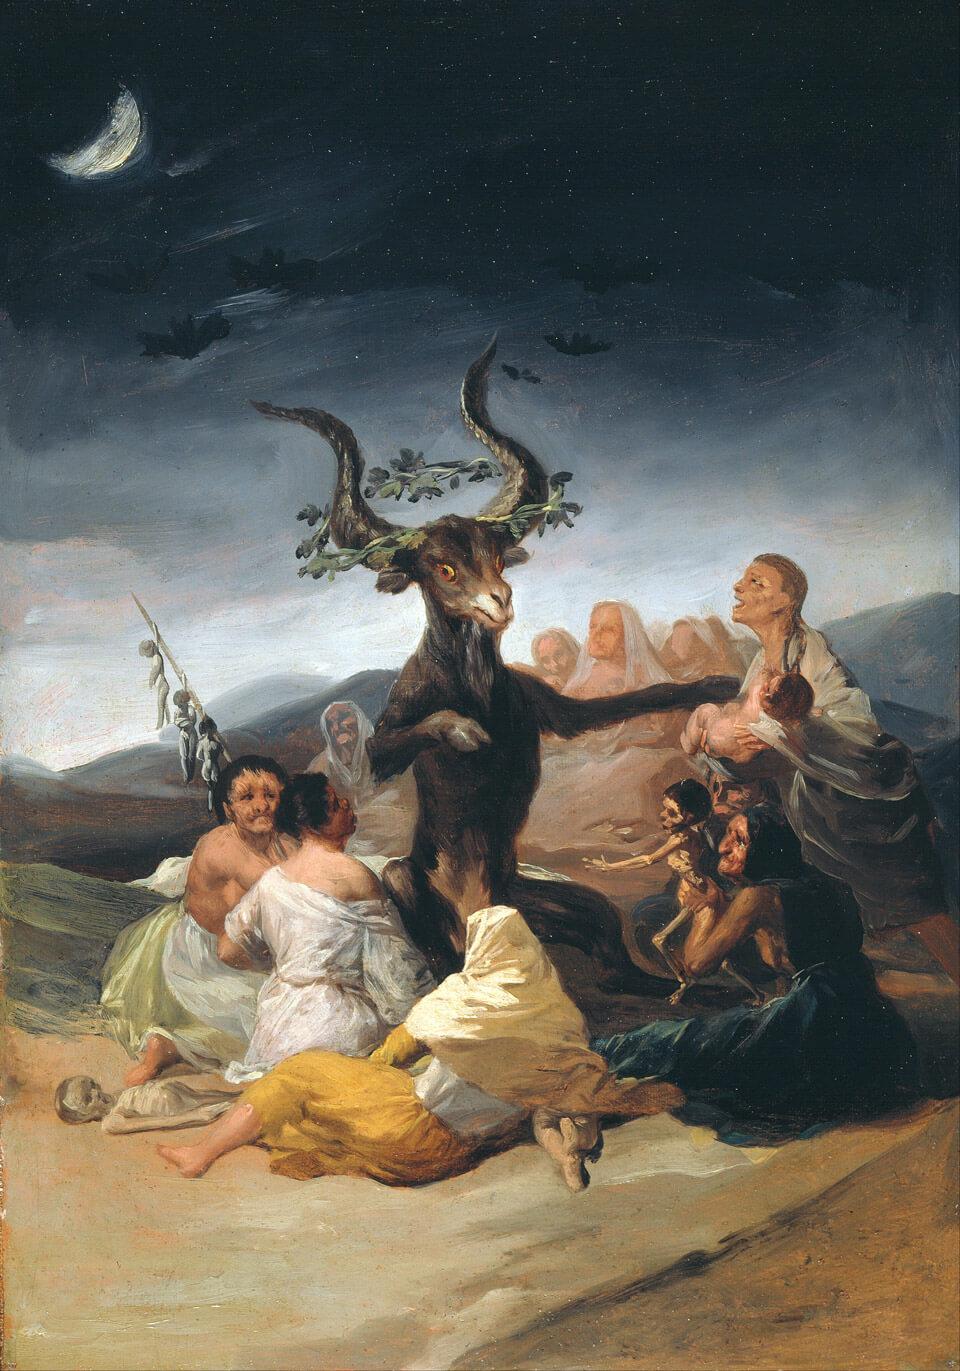 Apócrifa Art Magazine, Brujas, El aquelarre